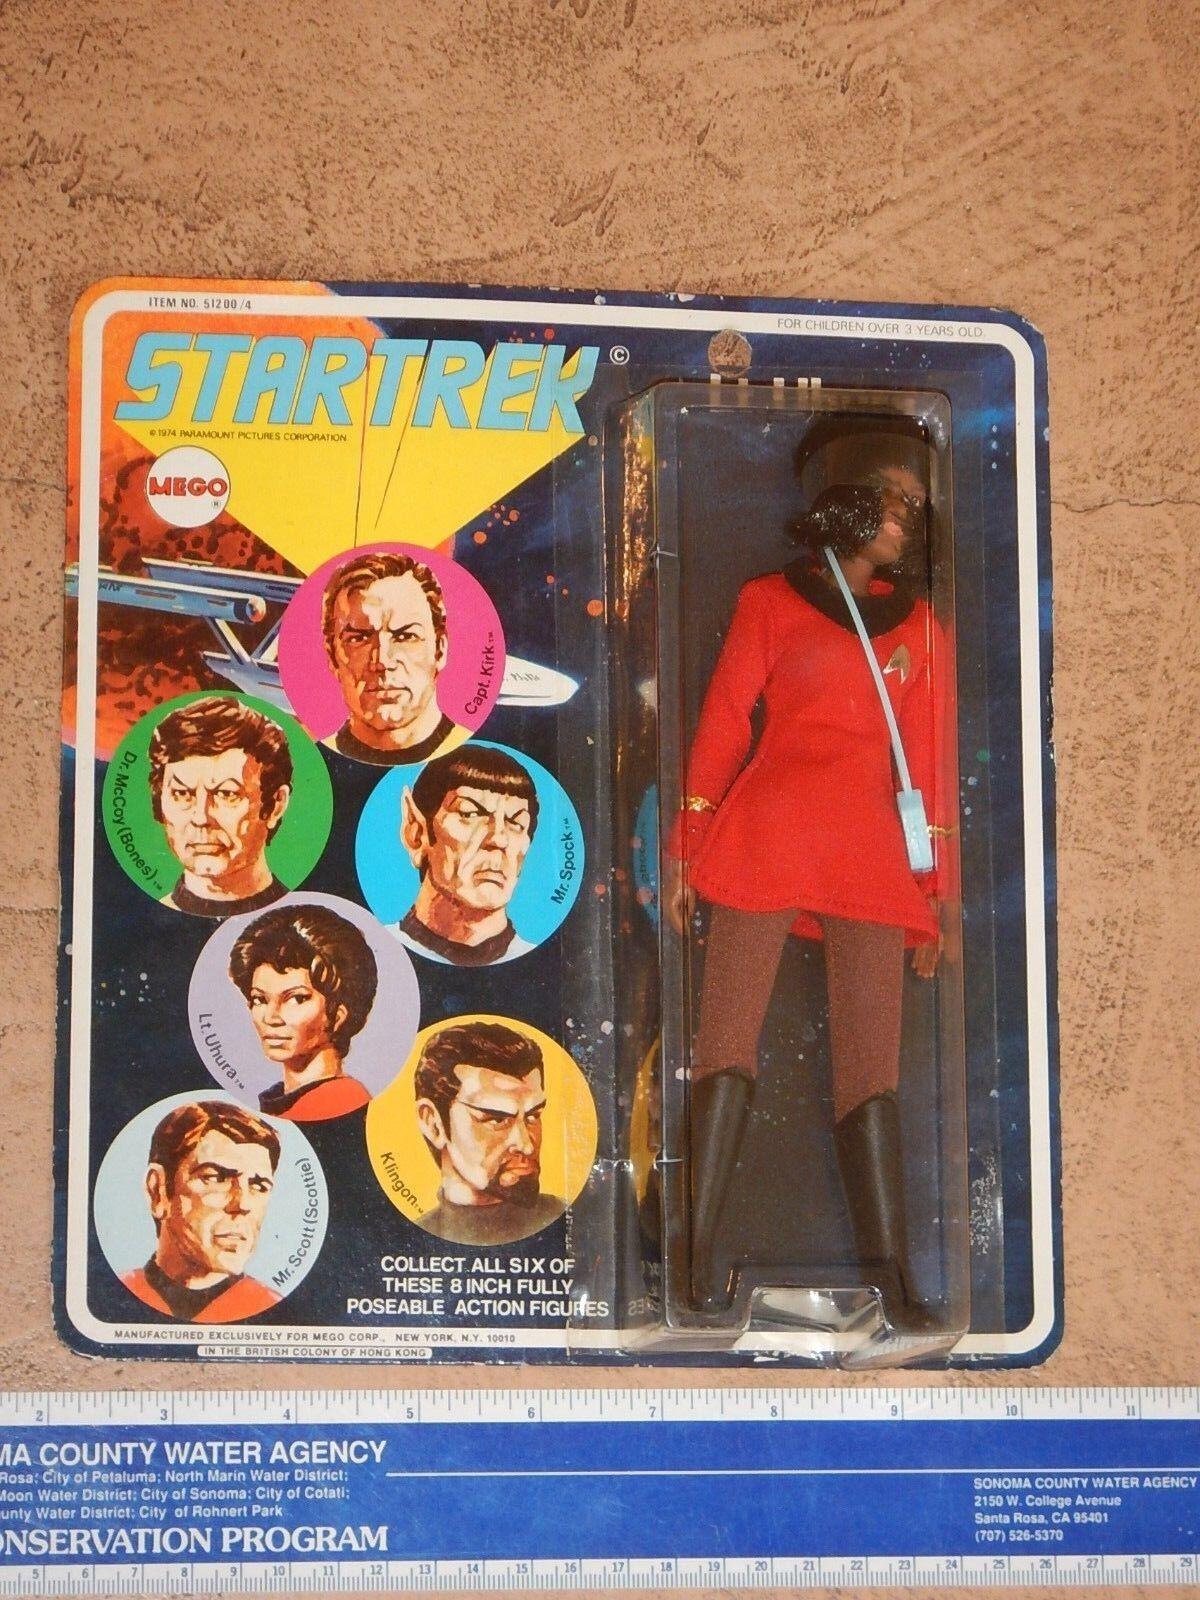 ORIGINAL 1974 MEGO STAR TREK LT. UHURA ACTION FIGURE, NOS FACTORY SEALED ON CARD